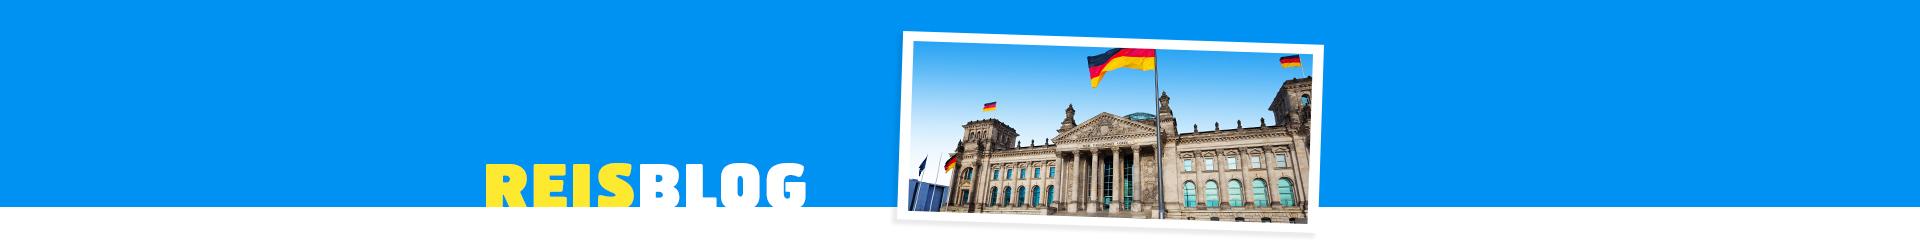 Duits gebouw